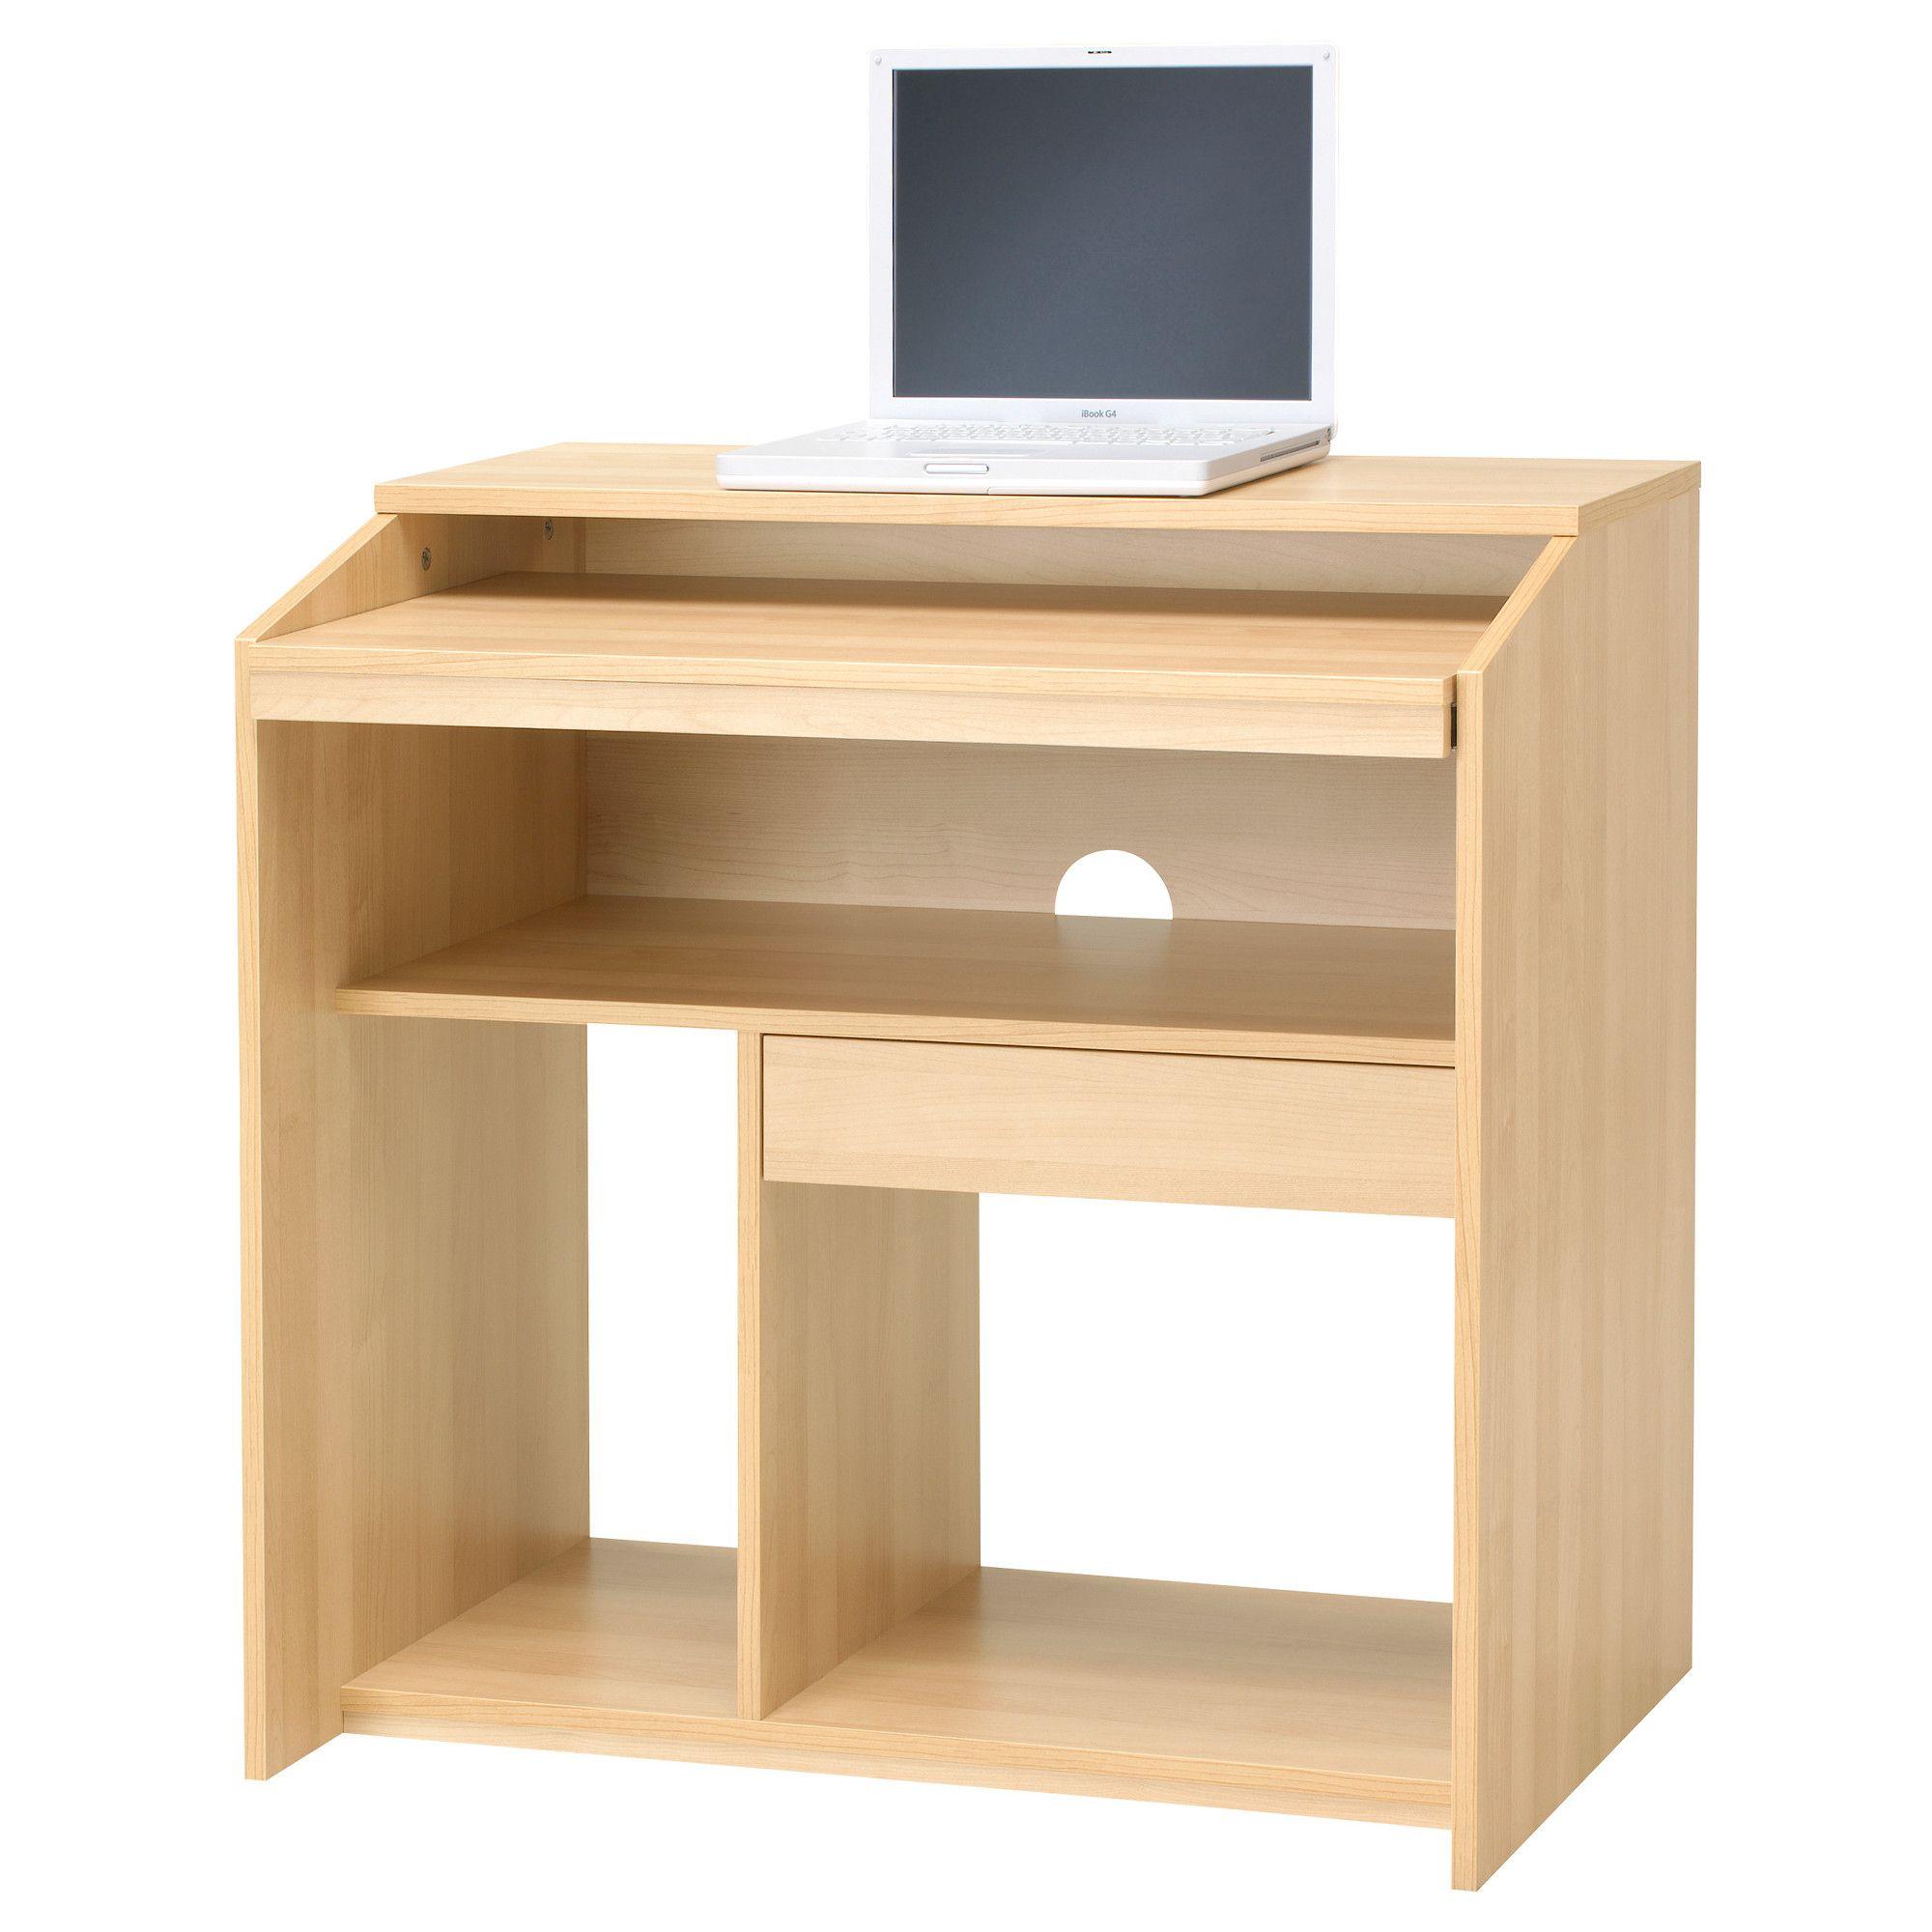 99 corner study desk ikea home office furniture